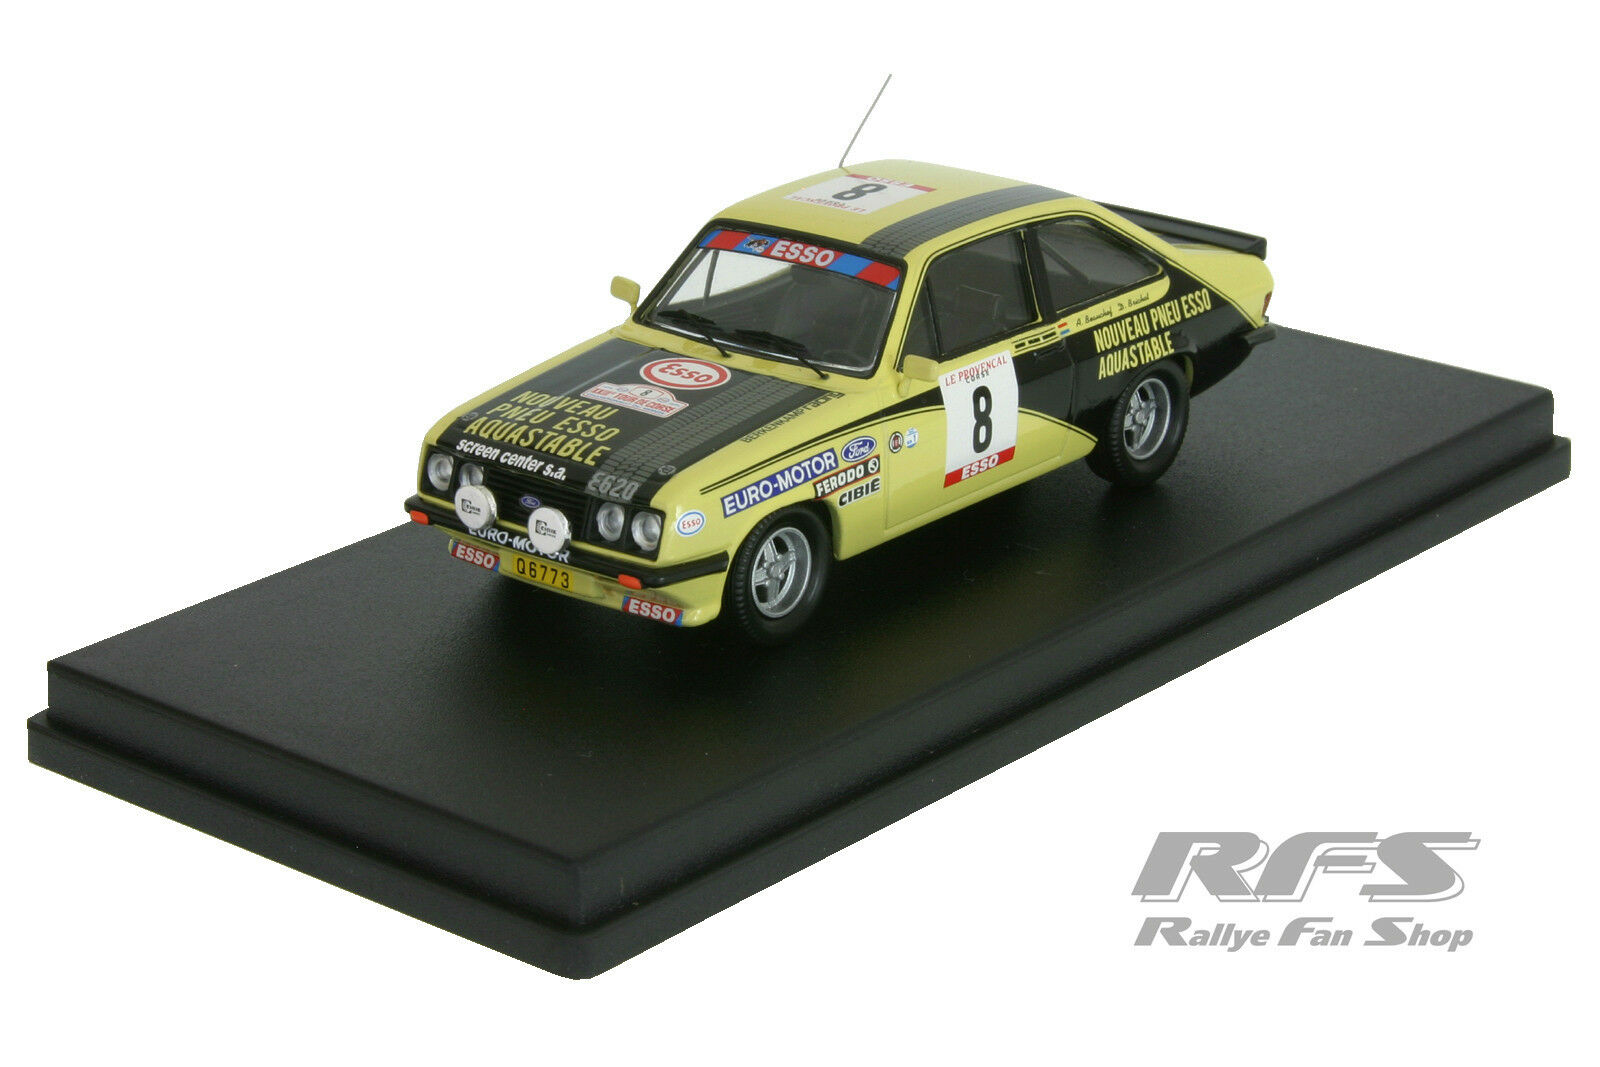 1 43 Ford escort rs 2000-beauchef Brichot-rallye tour de Corse 1979 trofeu